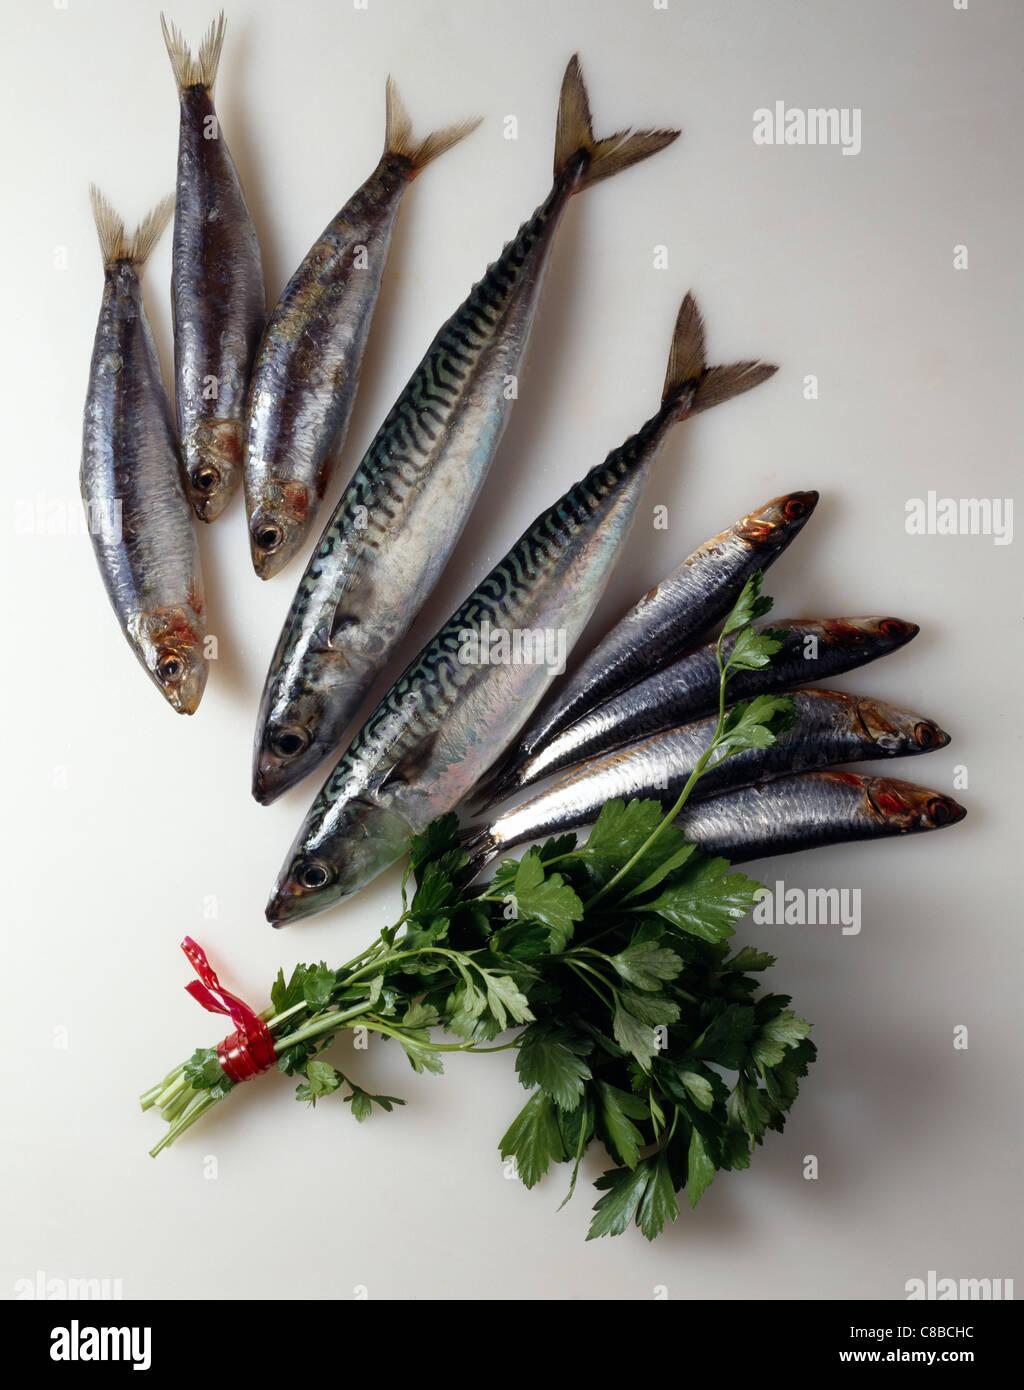 Fresh mackerel, sardines and anchovies - Stock Image